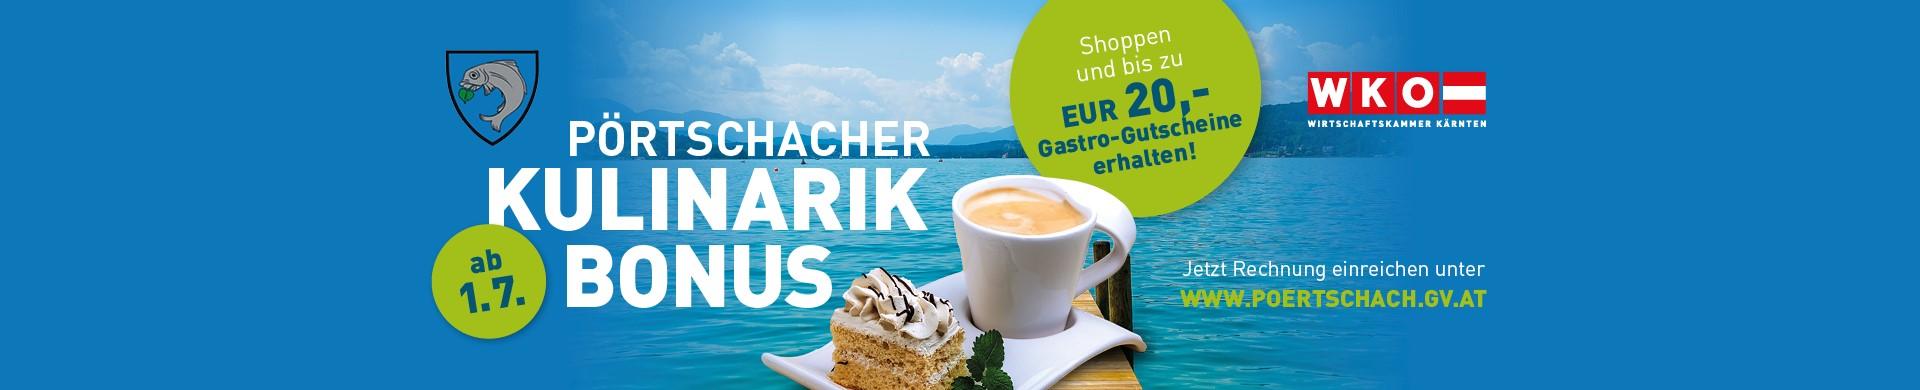 Pörtschacher Kulinarik-Bonus